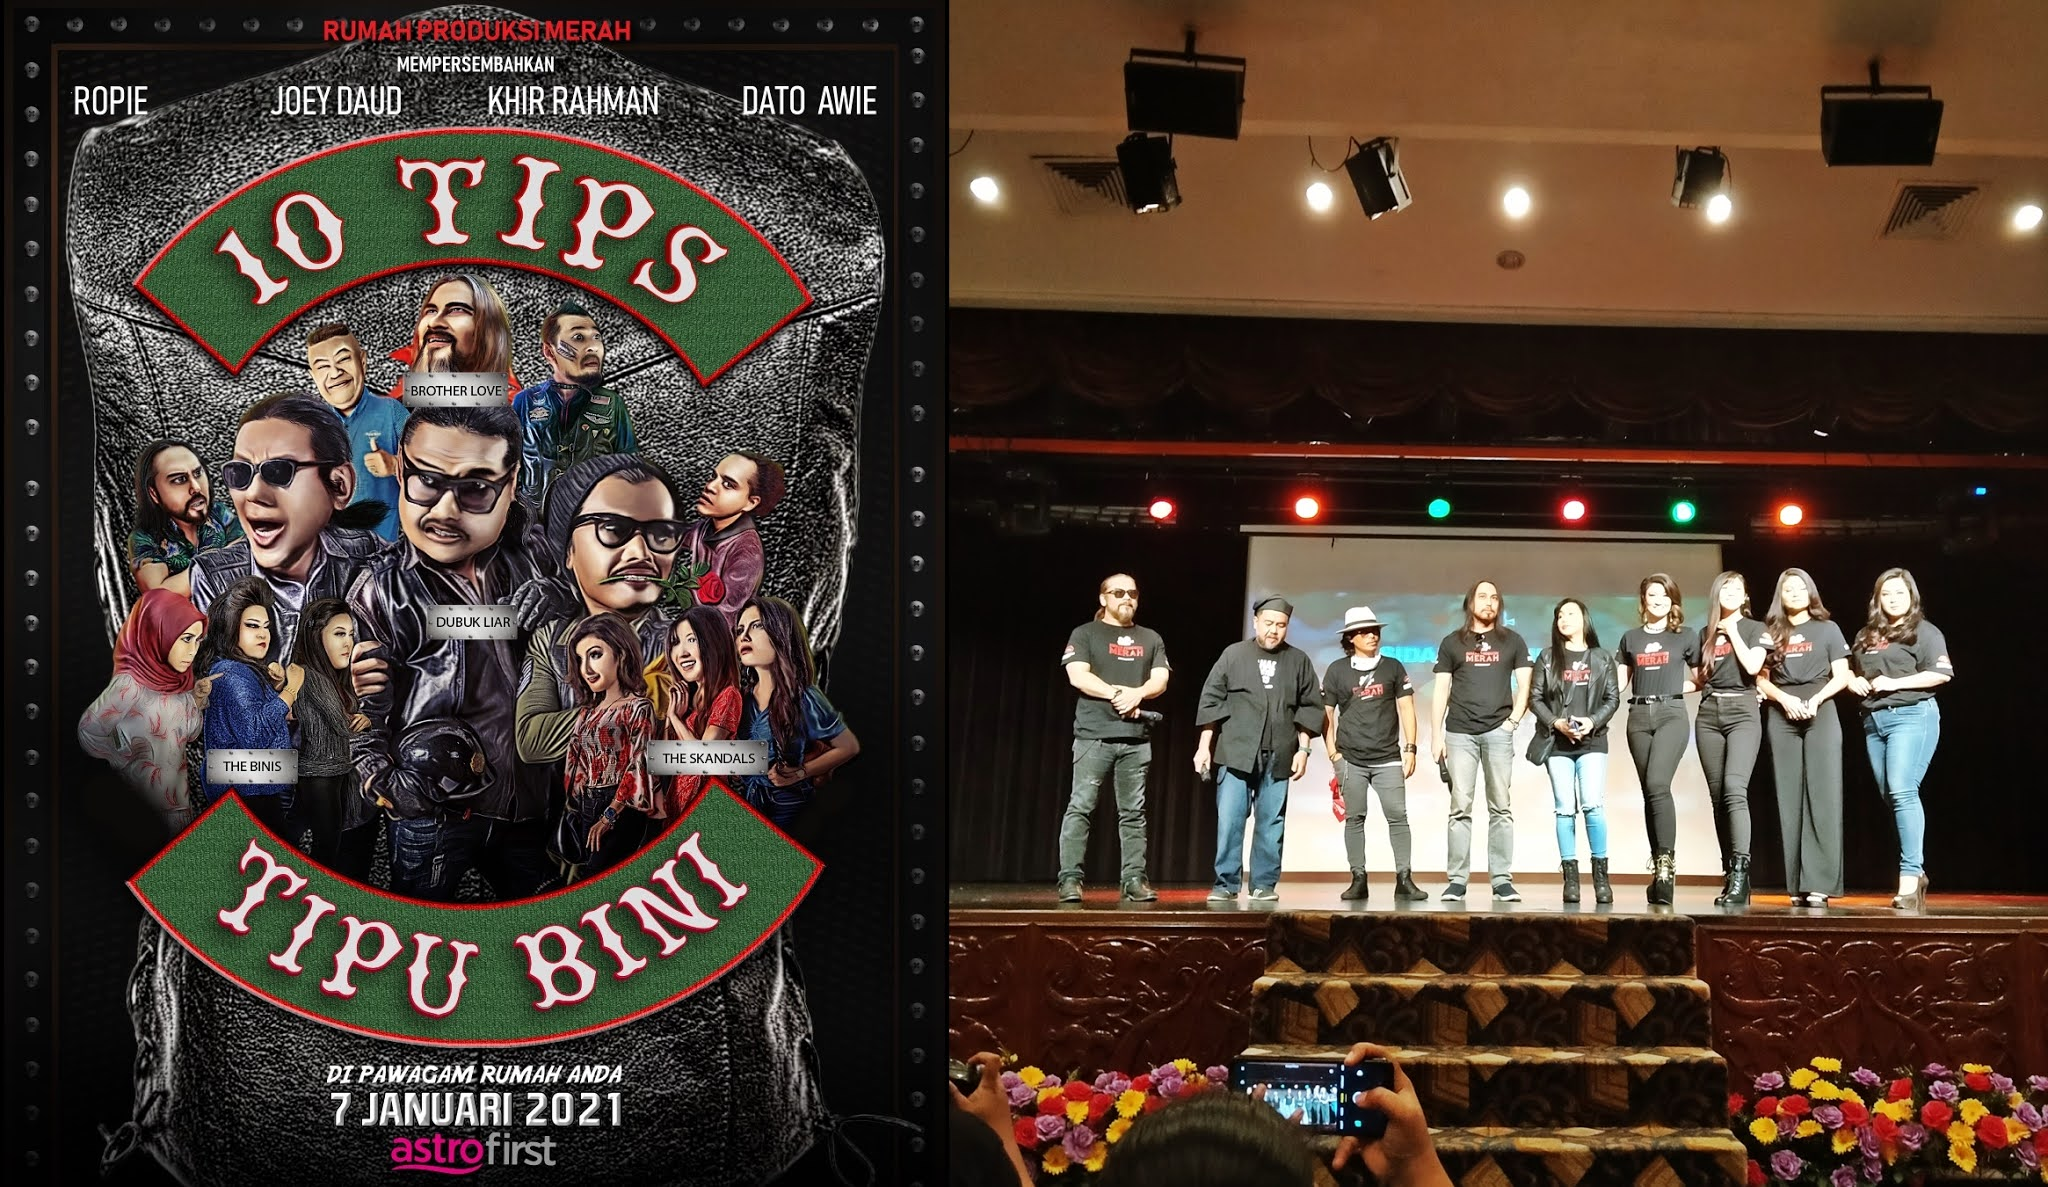 10 Tips Tipu Bini, Filem Komedi Pembuka Tirai 2021 Terbitan Dato' Awie !